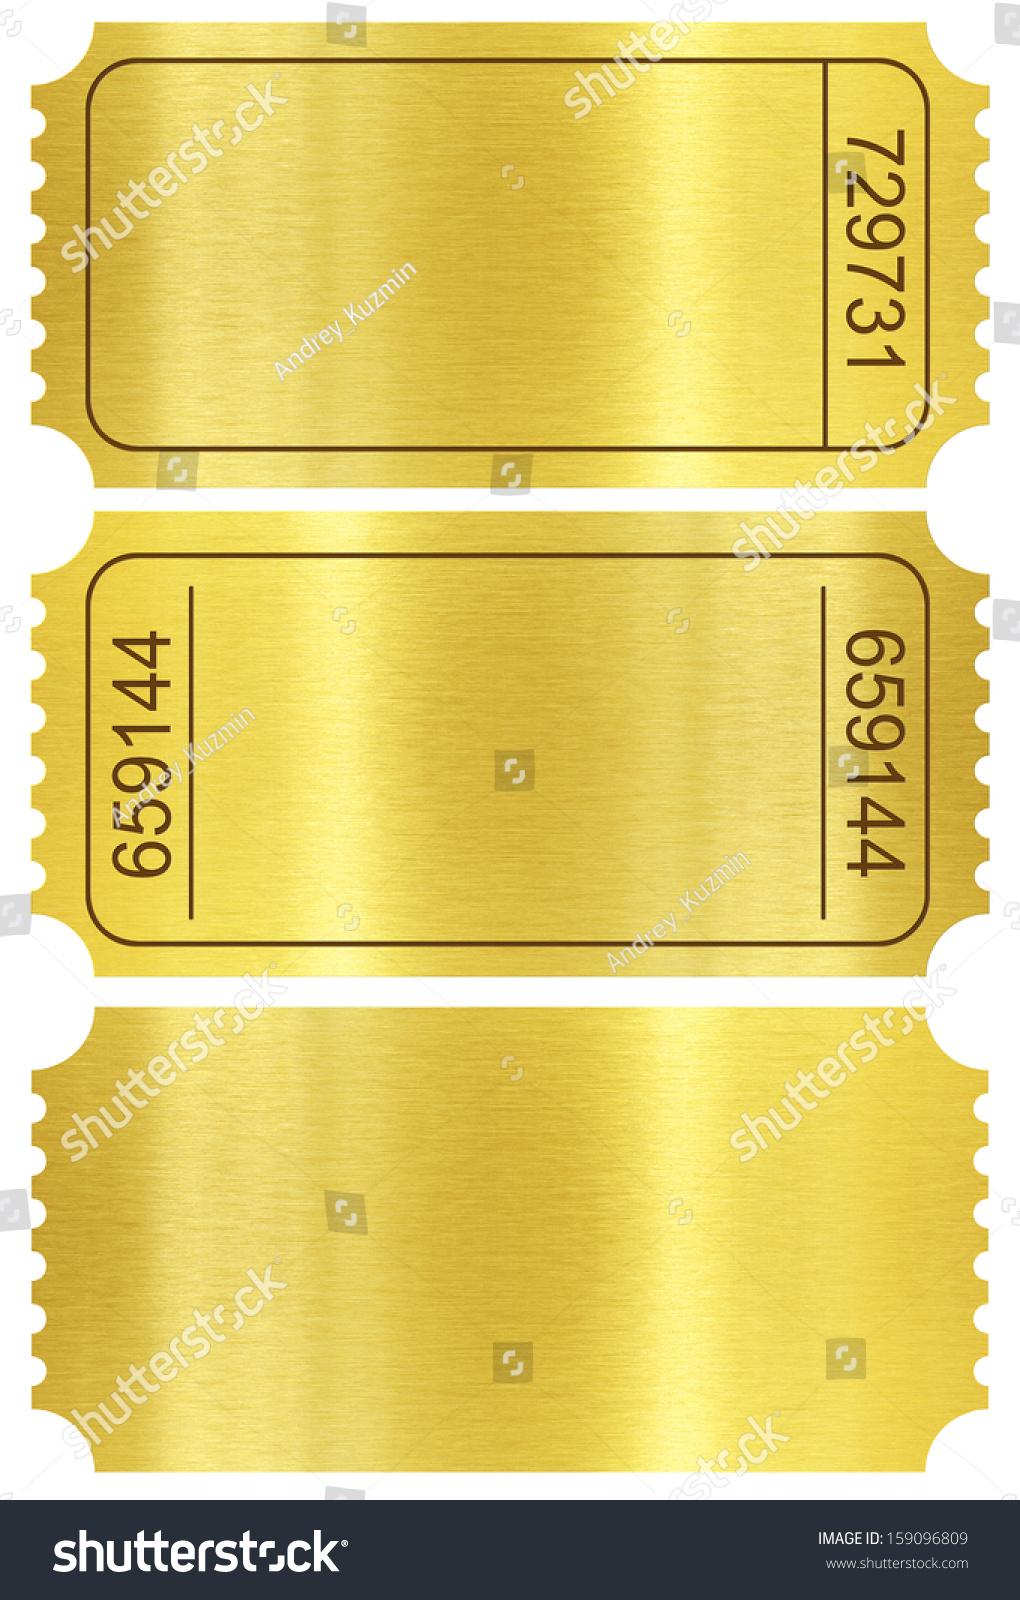 golden ticket templates info ticket set golden ticket templates set stock illustration